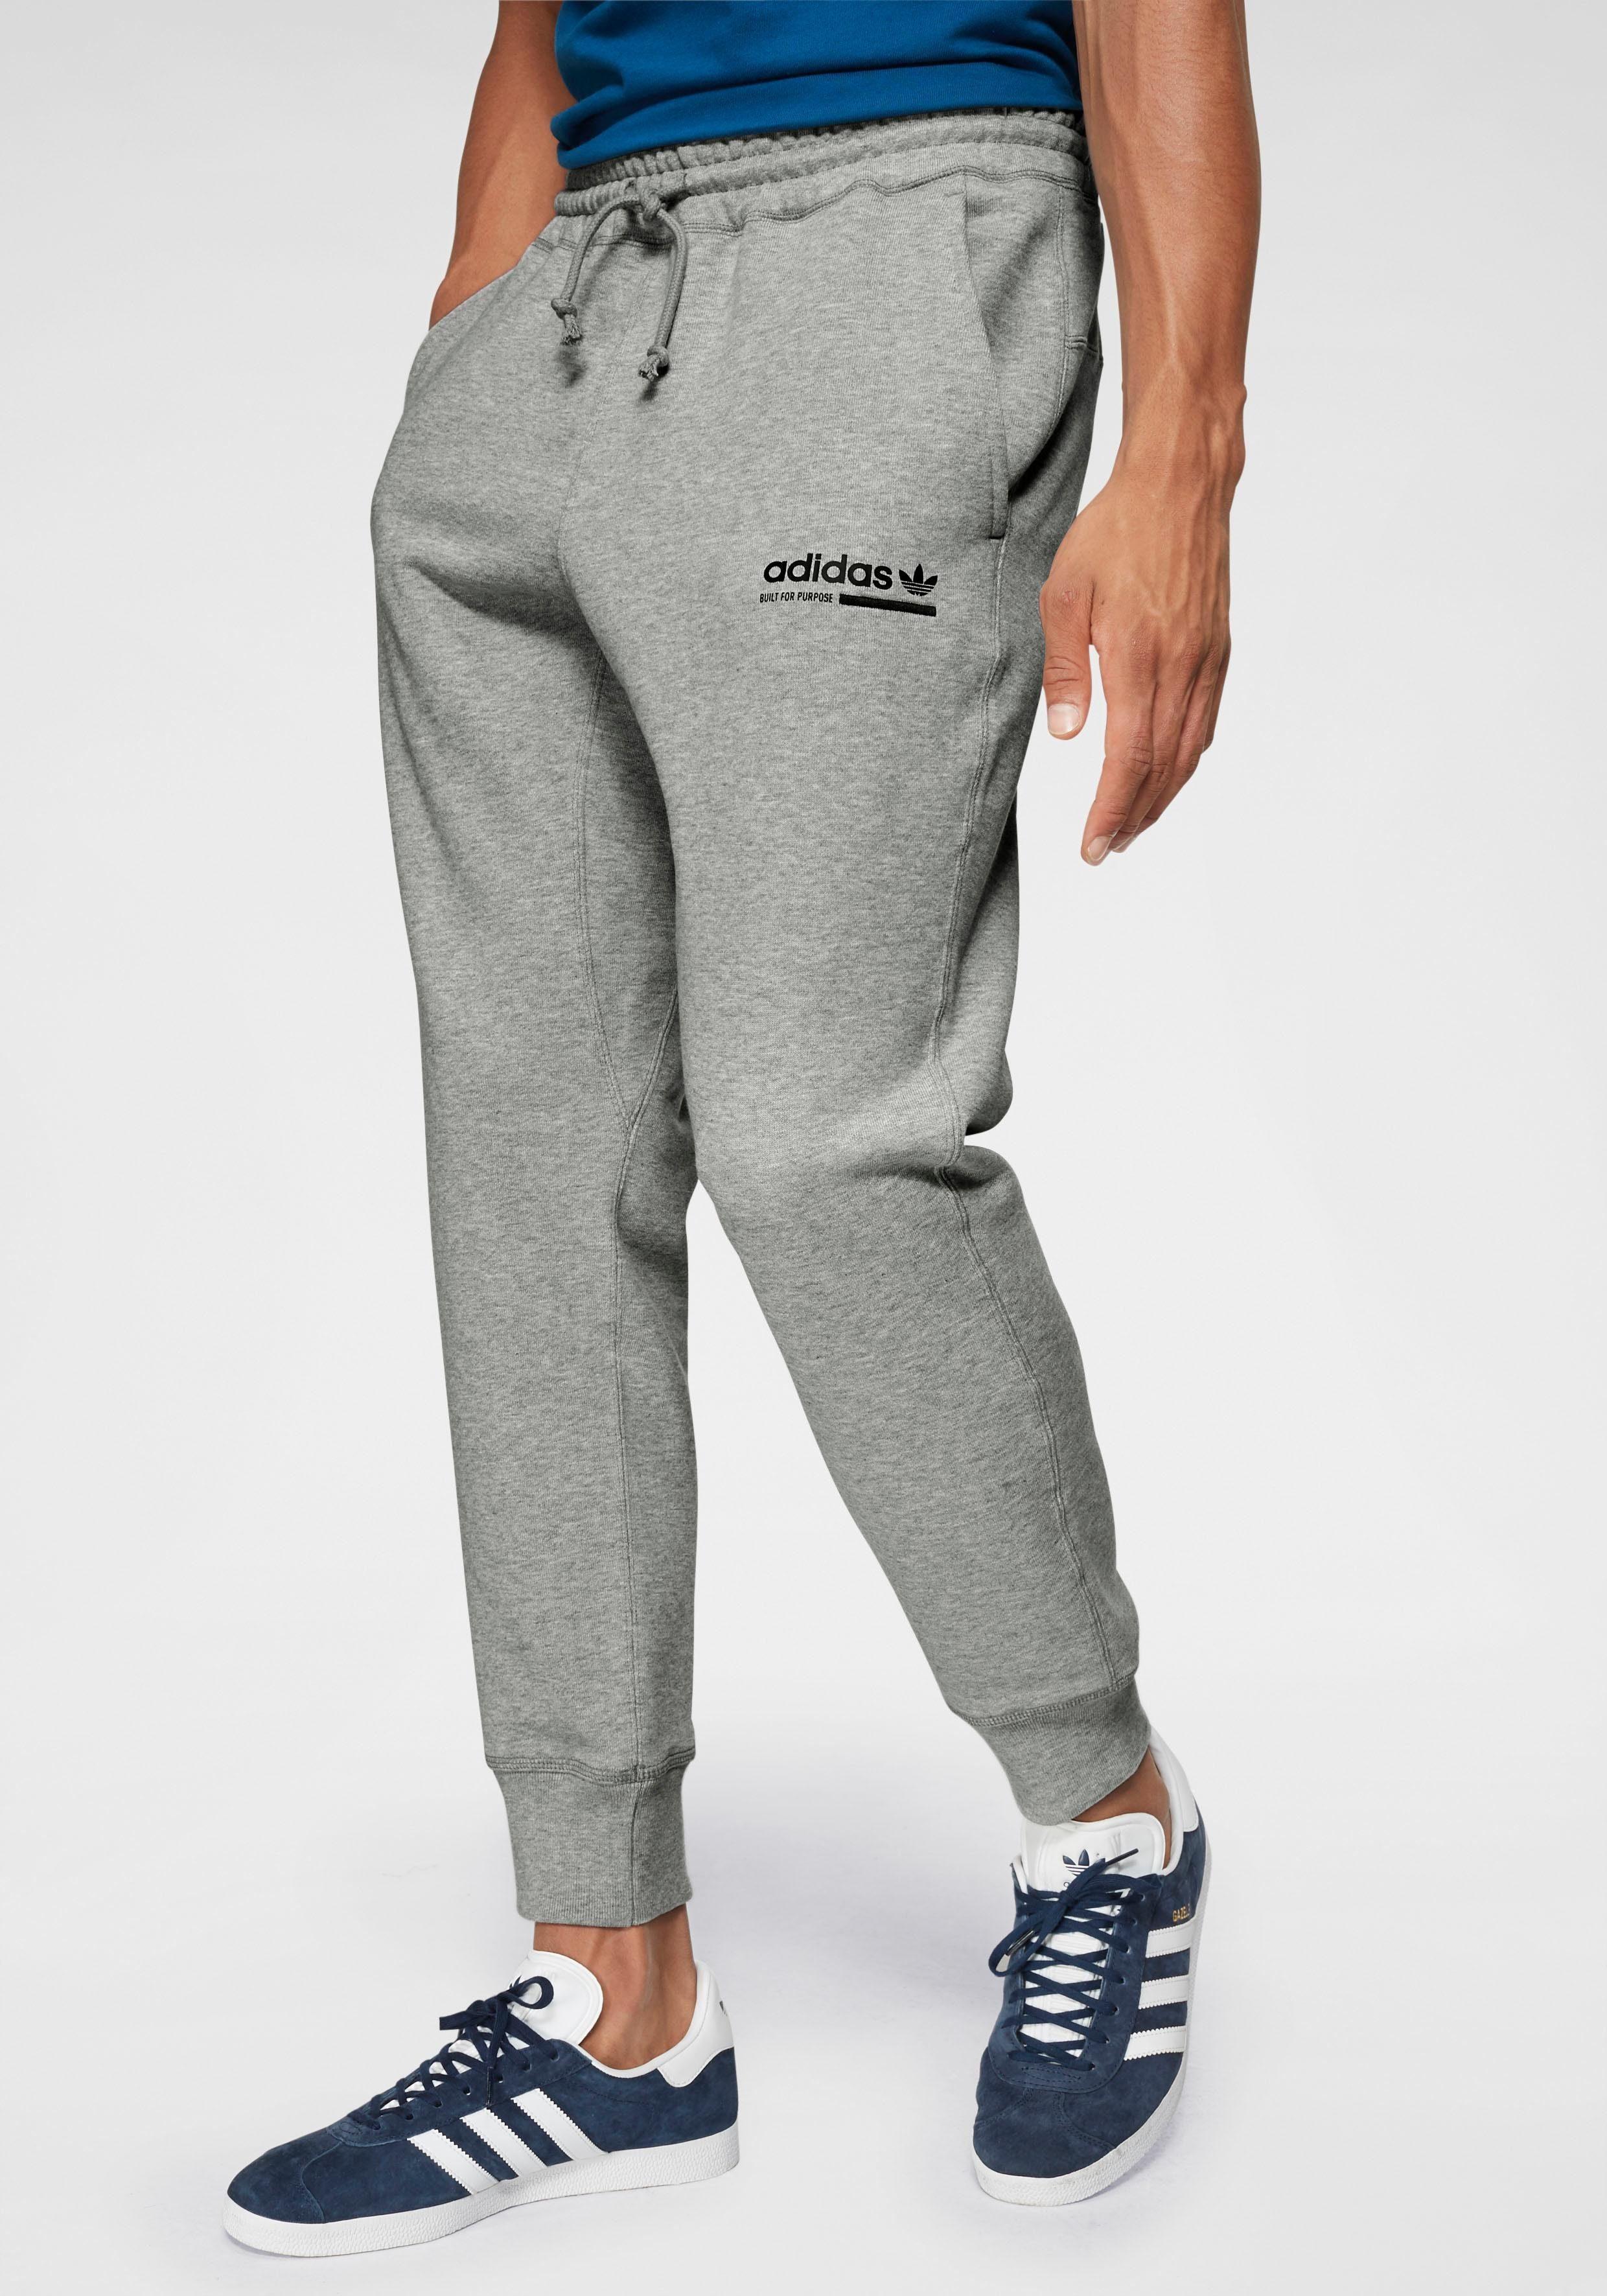 adidas Originals Jogginghose »SWEATPANT«